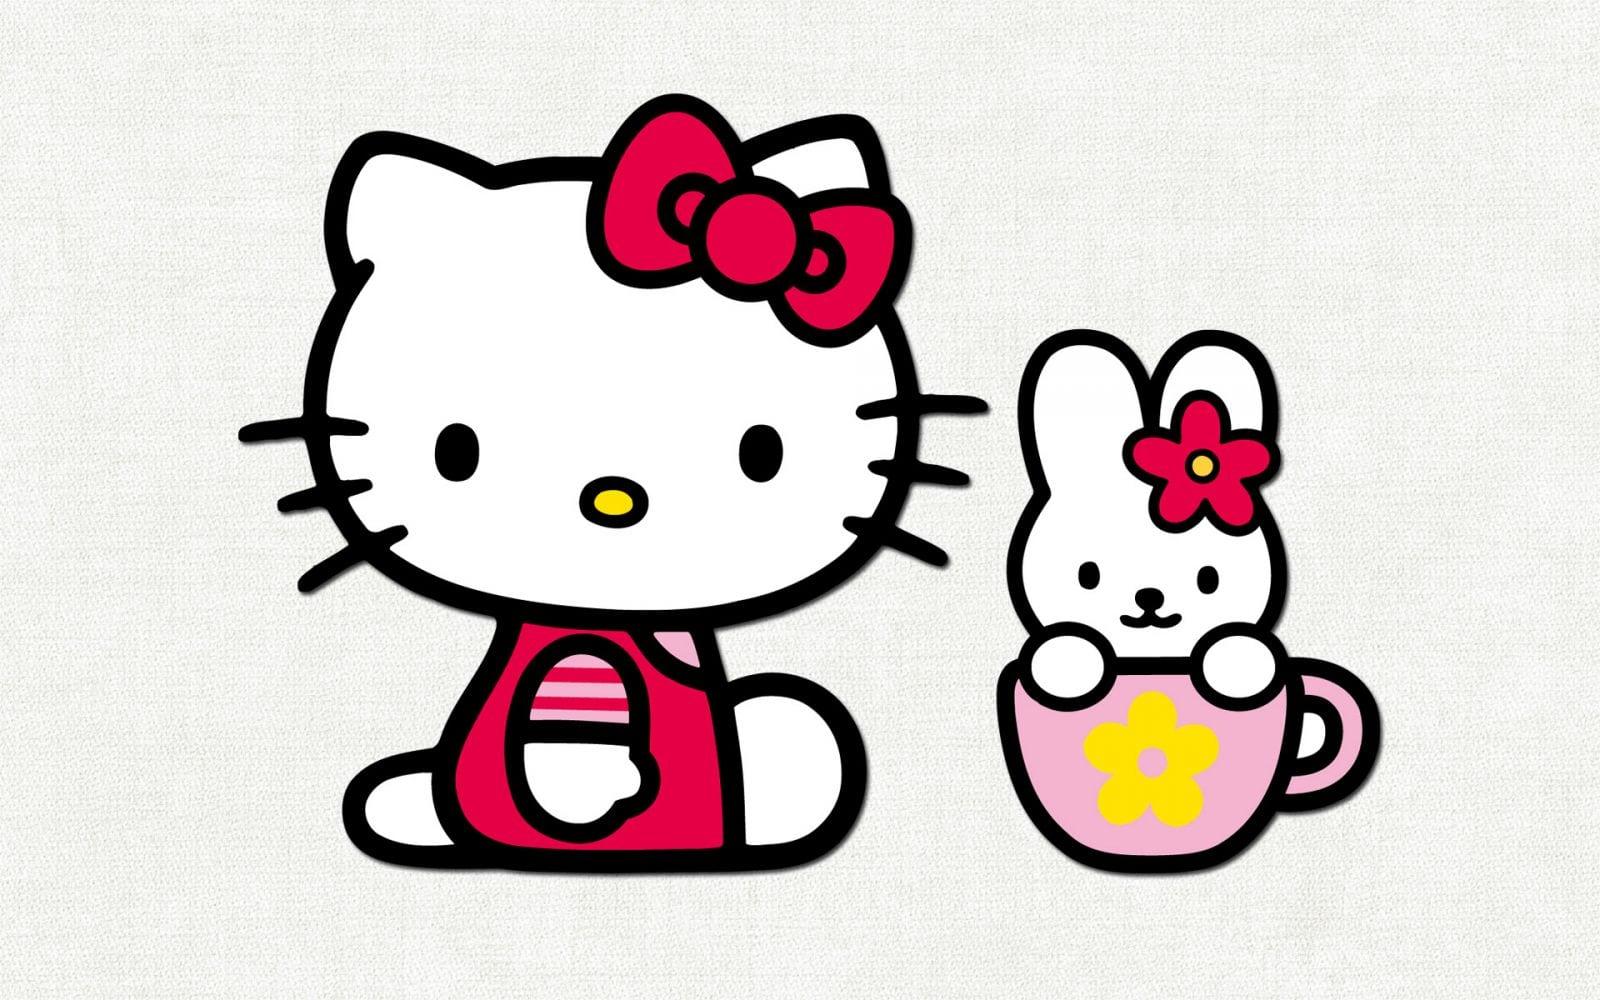 Hello Kitty E Coelho    Fotos E Imagens